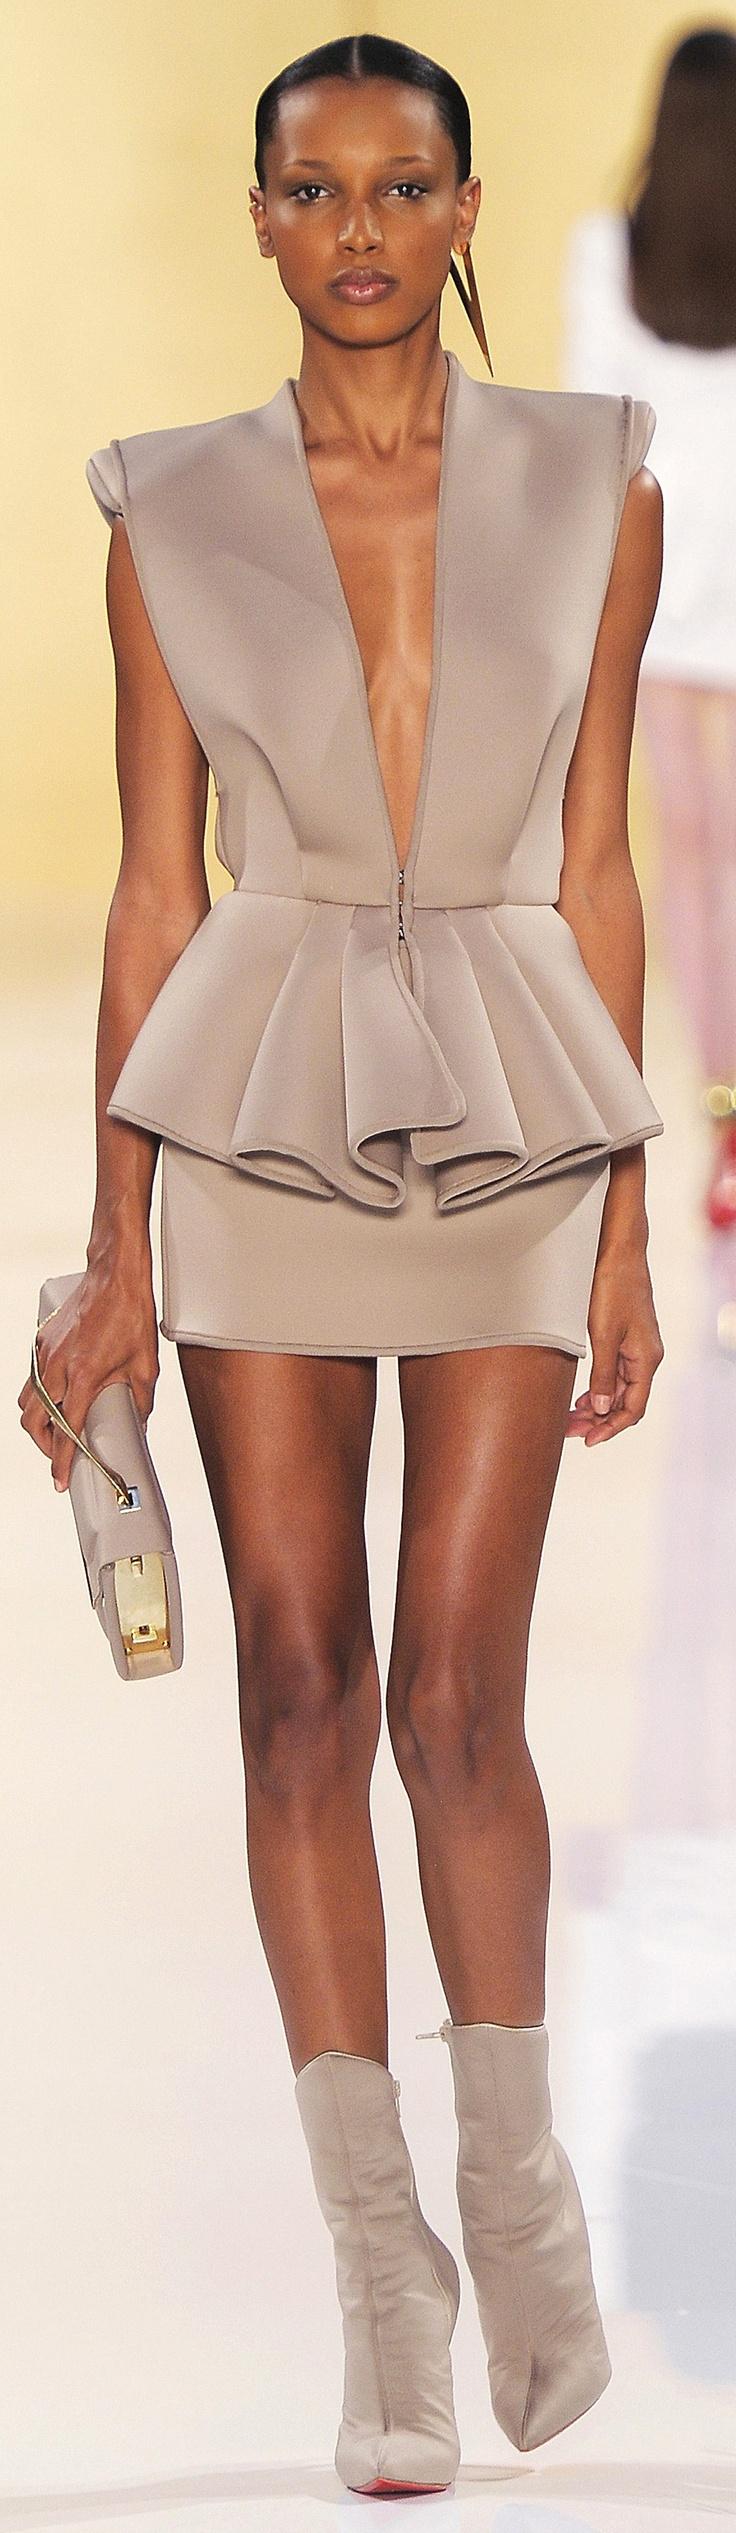 #Alexandre Vautier Haute Couture FW 2013: Couture Fw, Night Dresses, The Dresses, Shorts Formal Dresses, Alexandre Vautier, Dresses Women, Dresses Shorts Form, Shorts Dresses Couture, Haute Couture